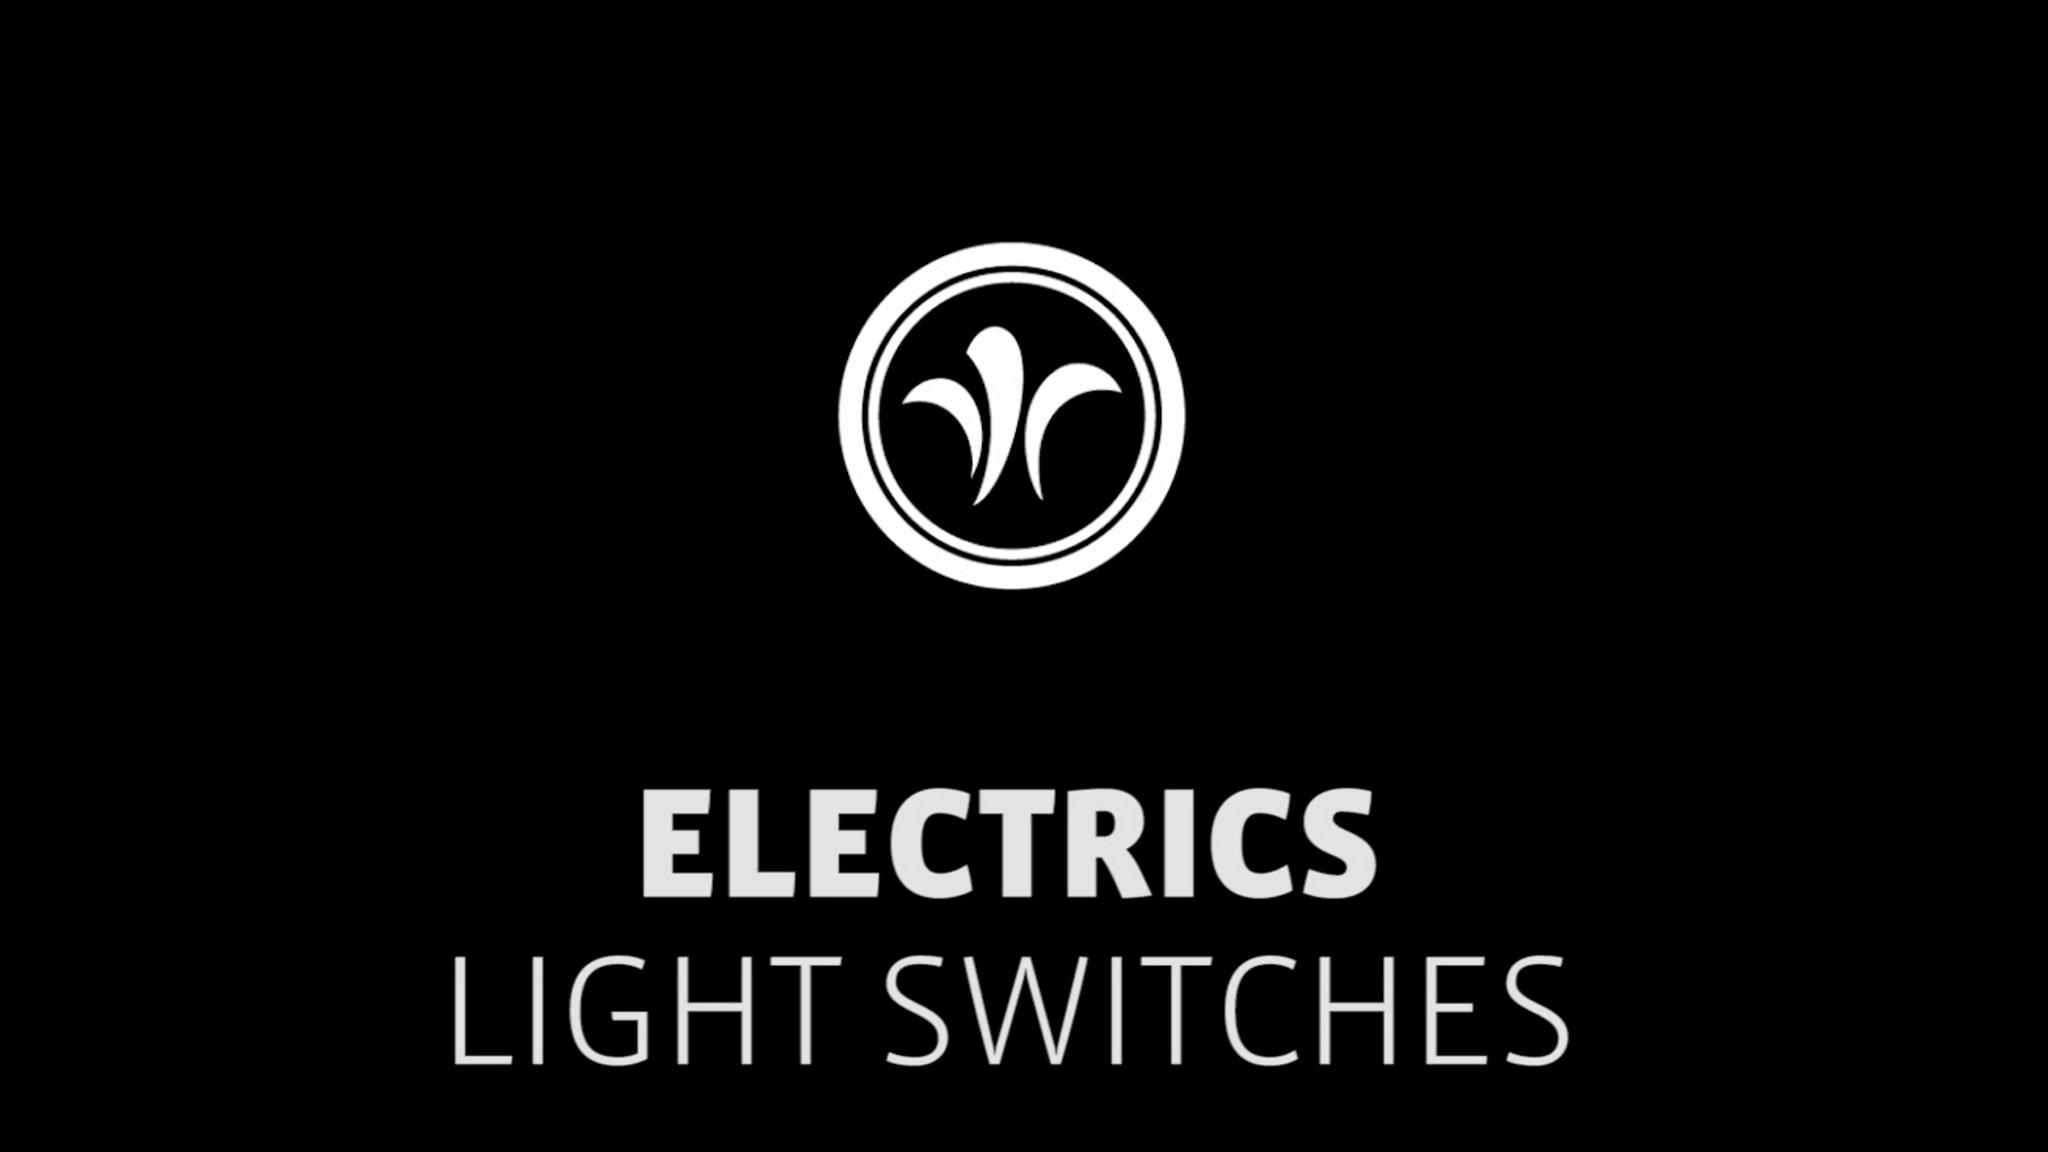 motorhome lightswitch // niesmann+bischoff - camper (model ARTO) // 2019 // EL2